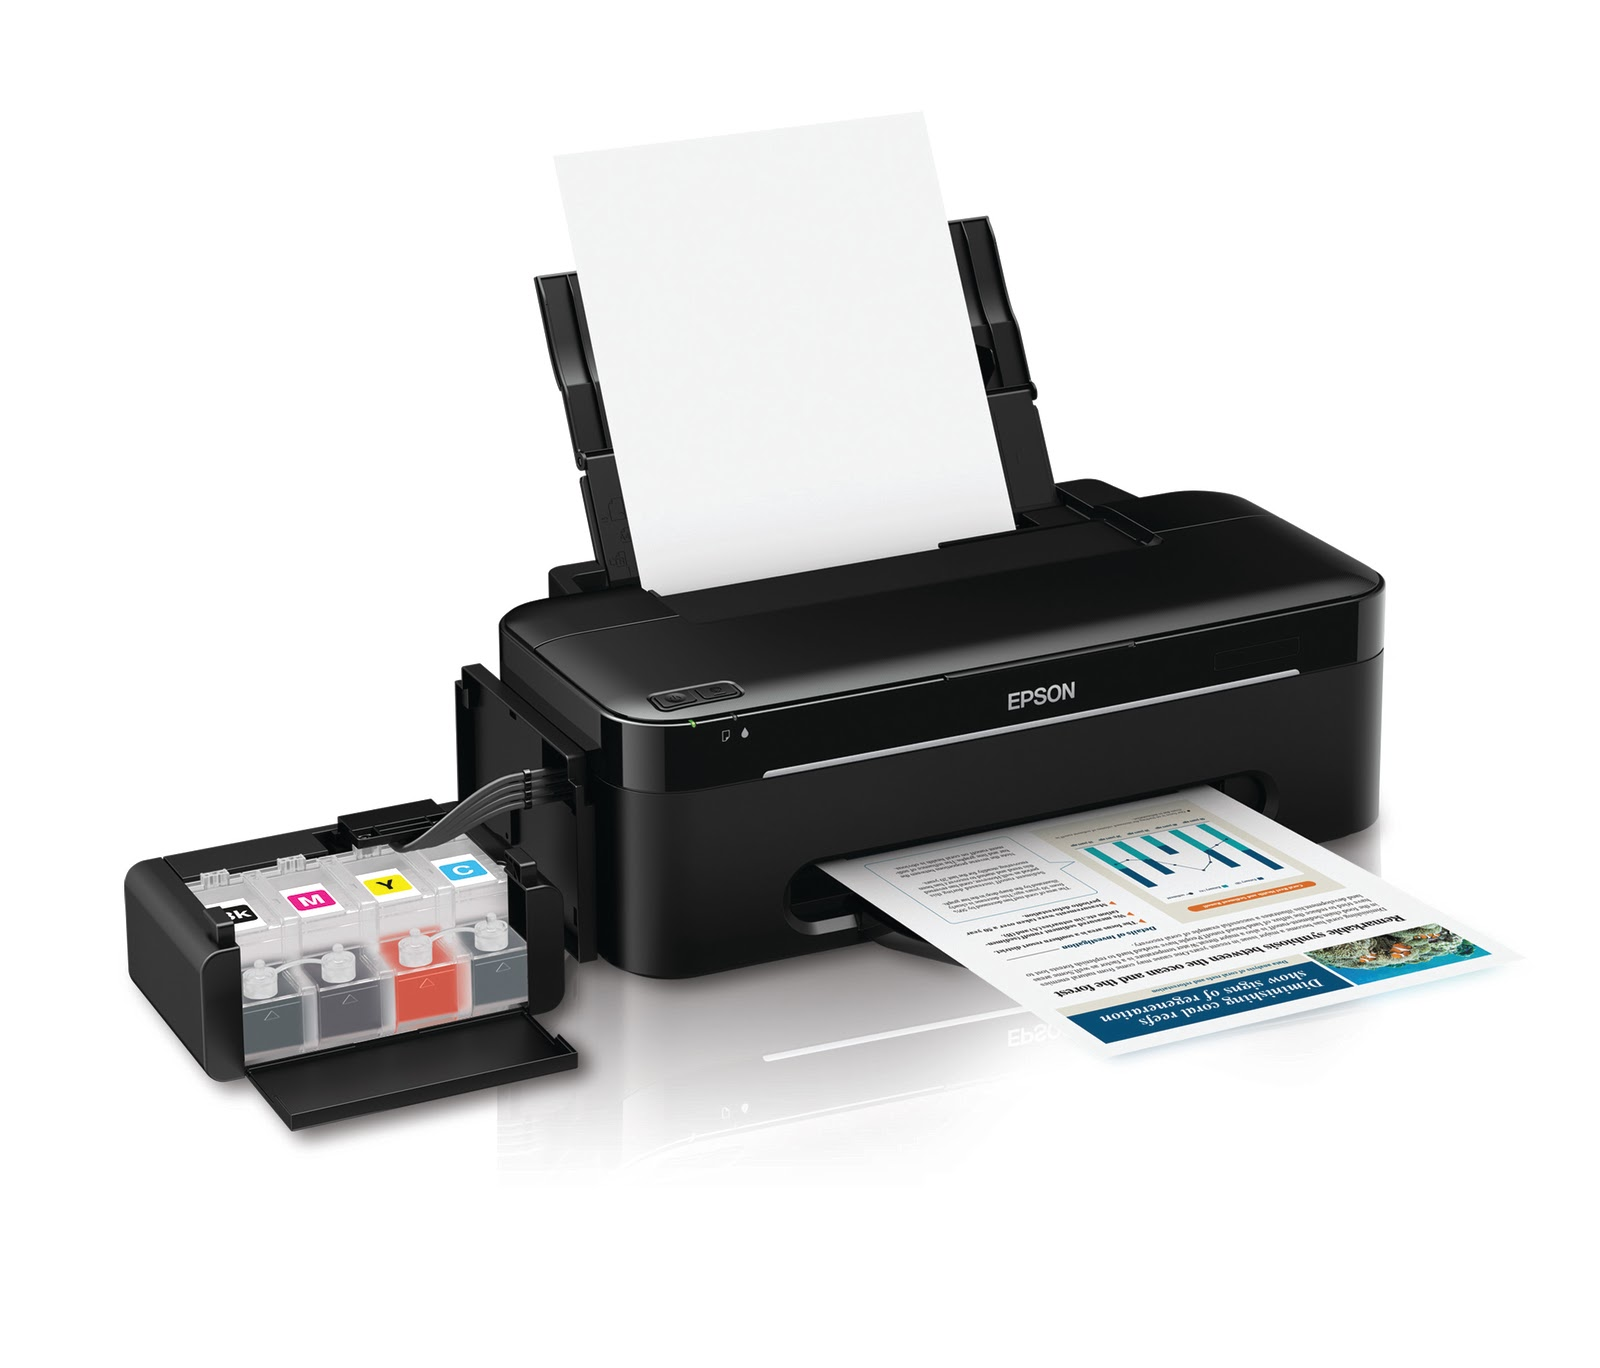 Impresora Epson L200 - Epson L200 con Tinta Continua Original